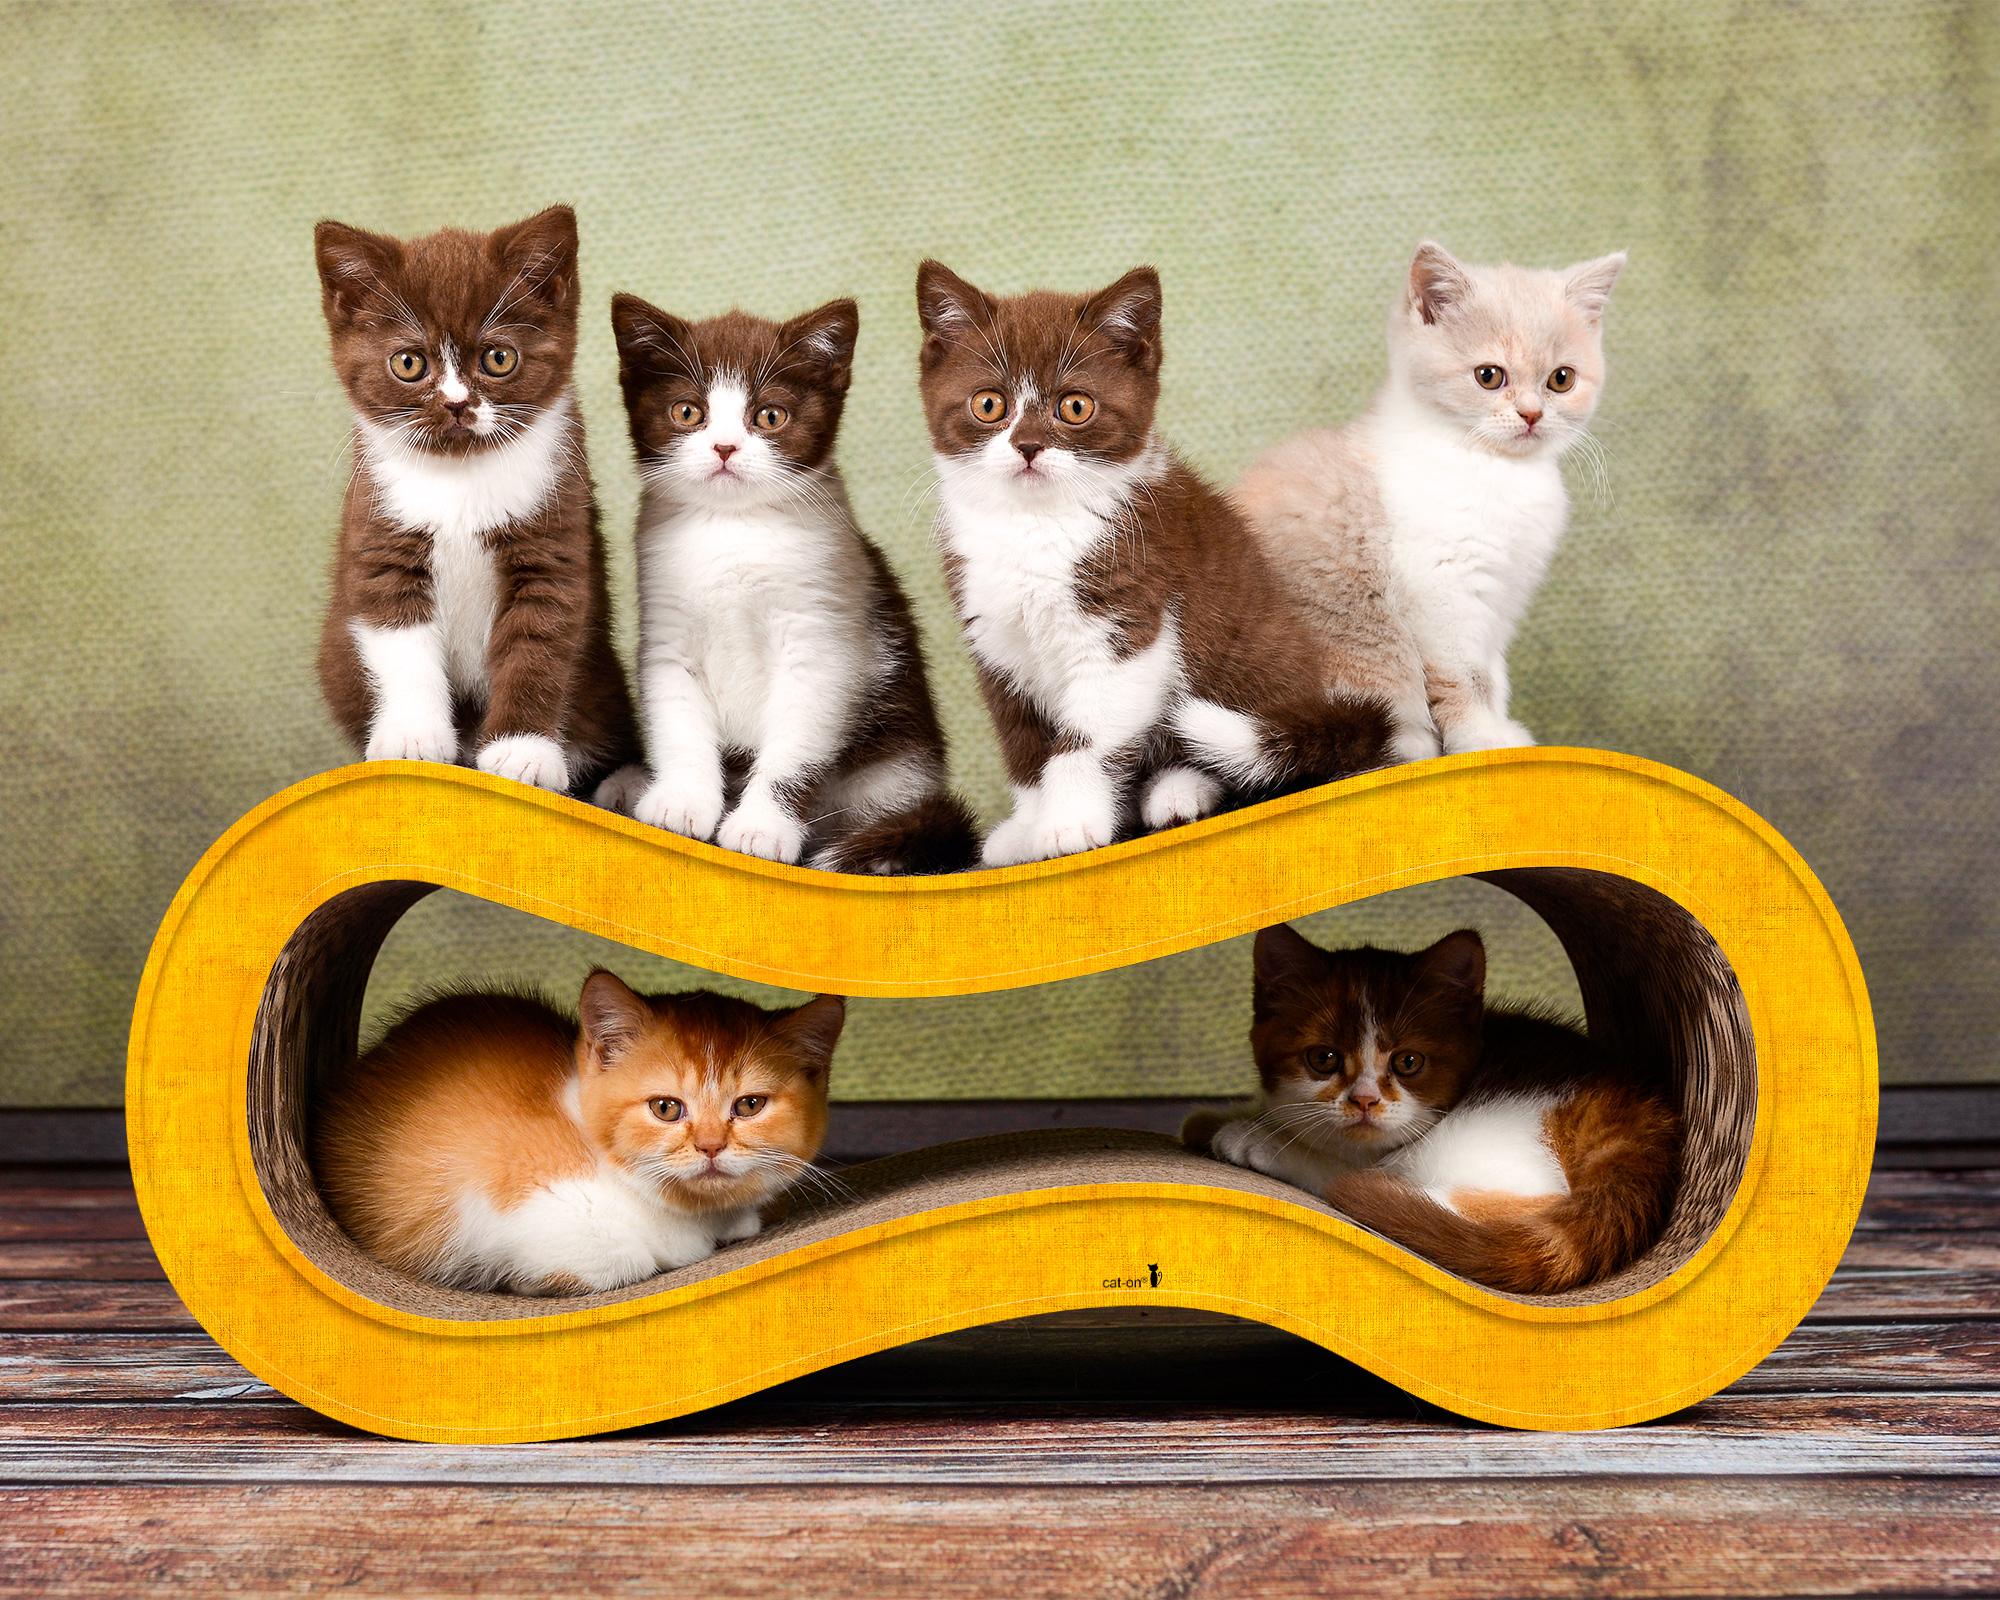 Katzenmöbel aus Karton & Kratzpappe Singha M - Farbe dunkelgelb